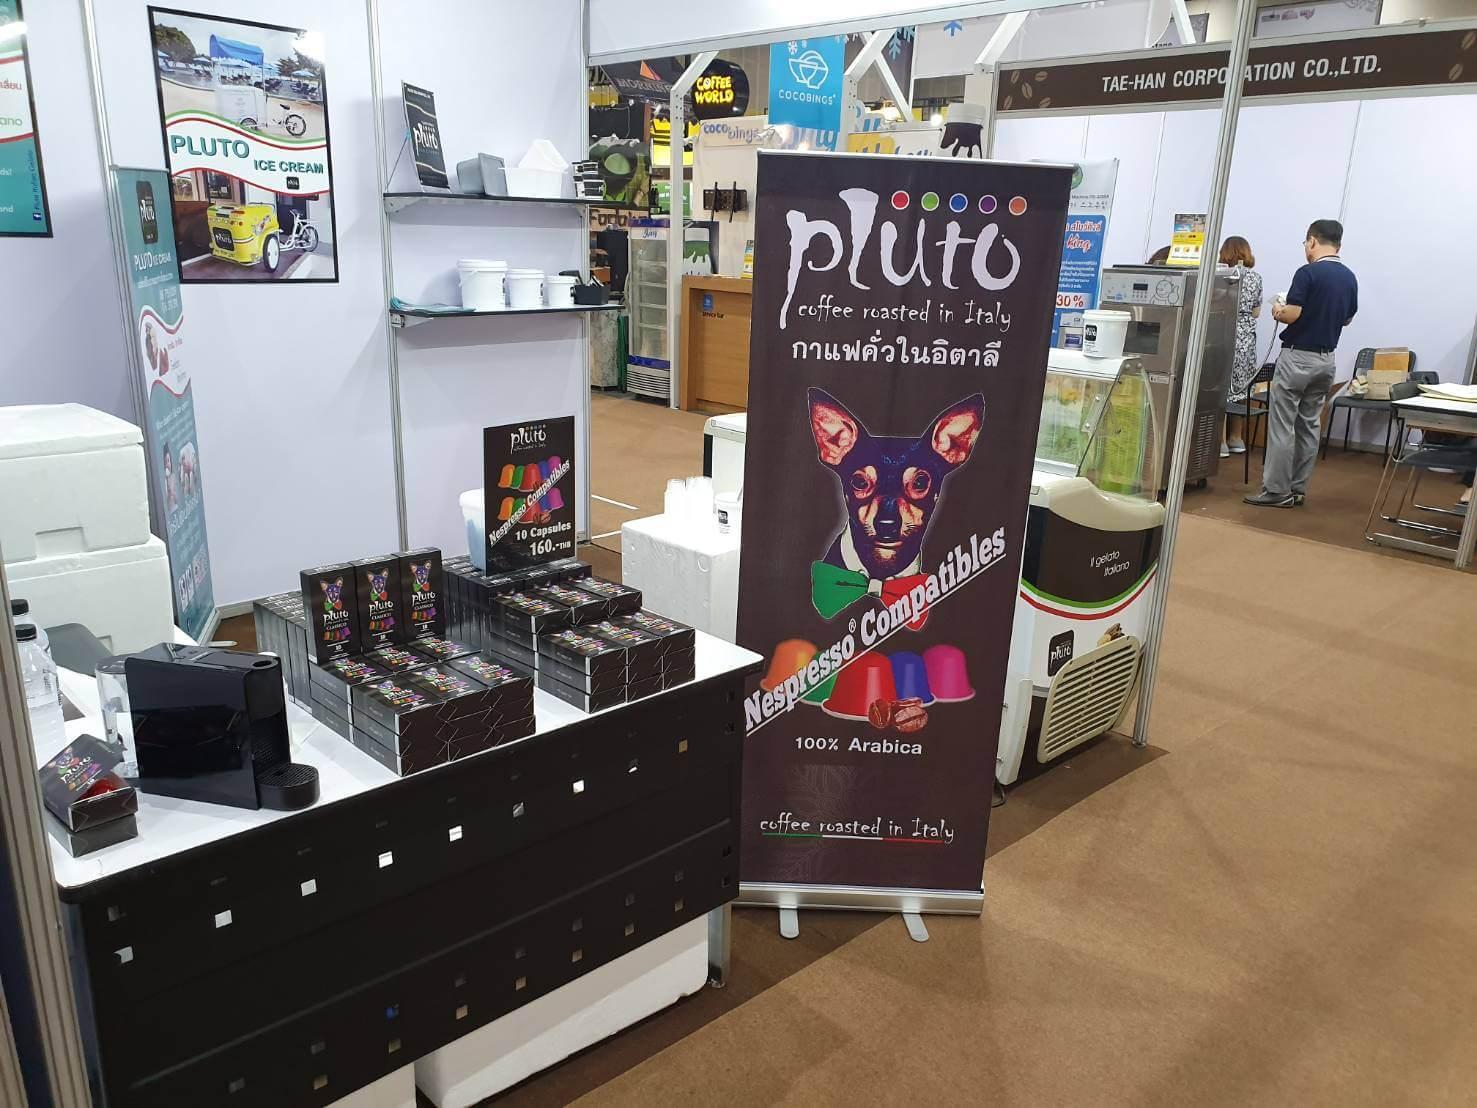 Pluto Coffee Capsule Exhibition